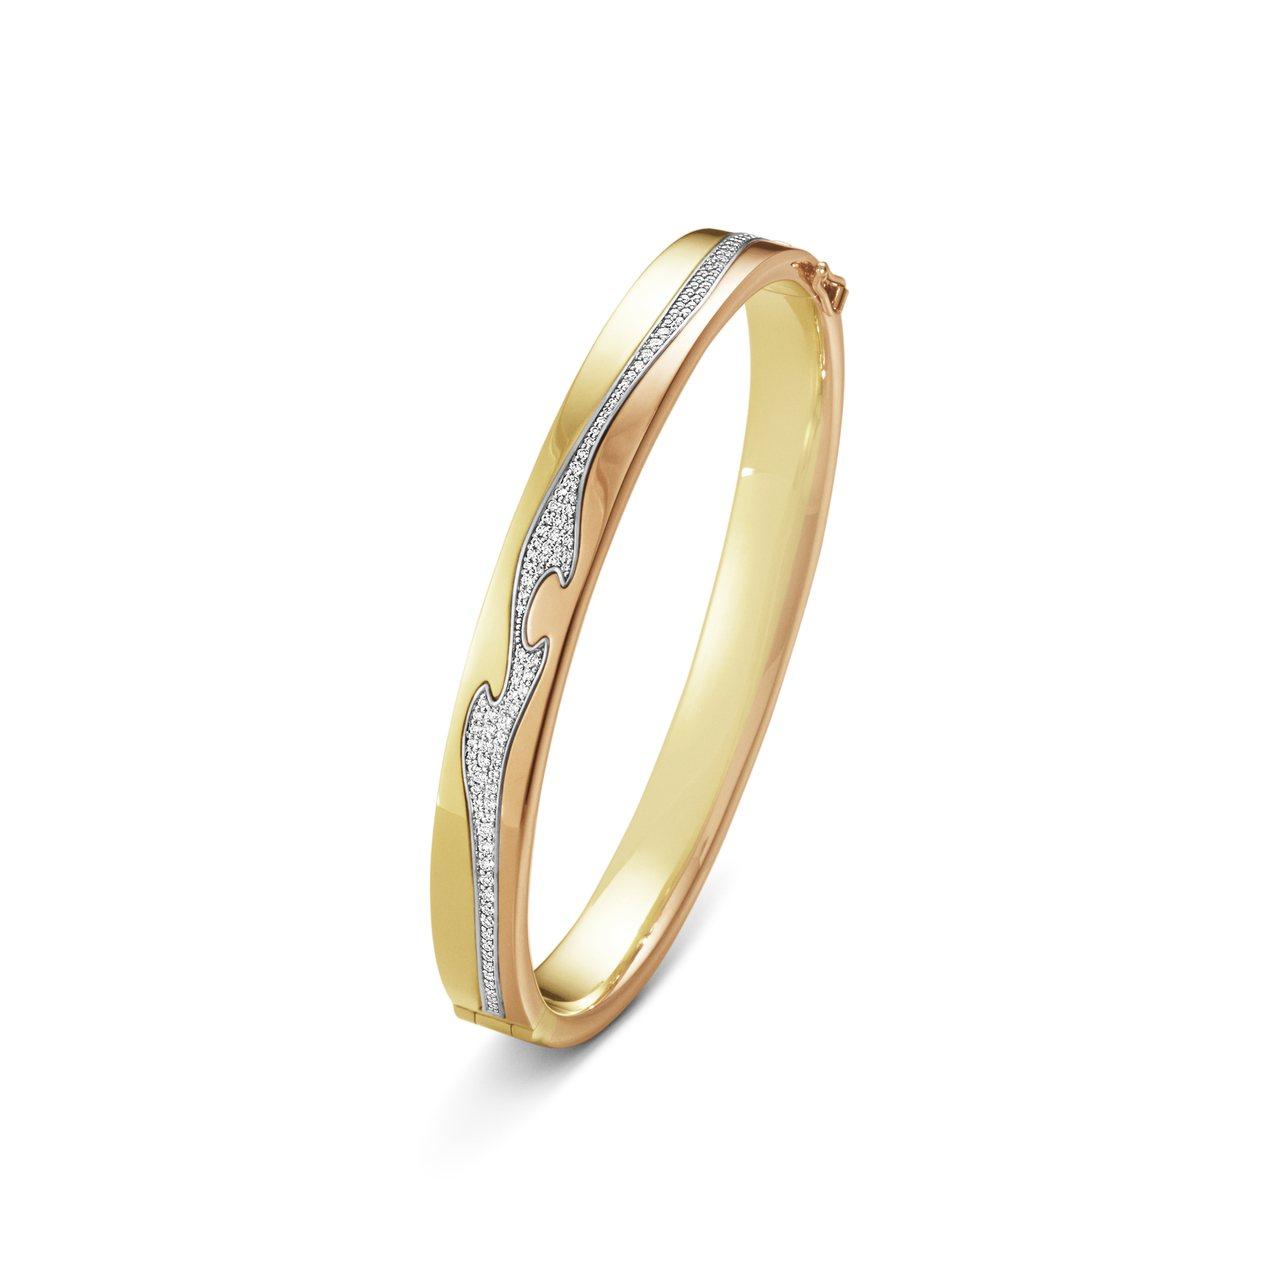 GEORG JENSEN NEW FUSION系列18K黃金玫瑰金搭配白金鋪鑲鑽...